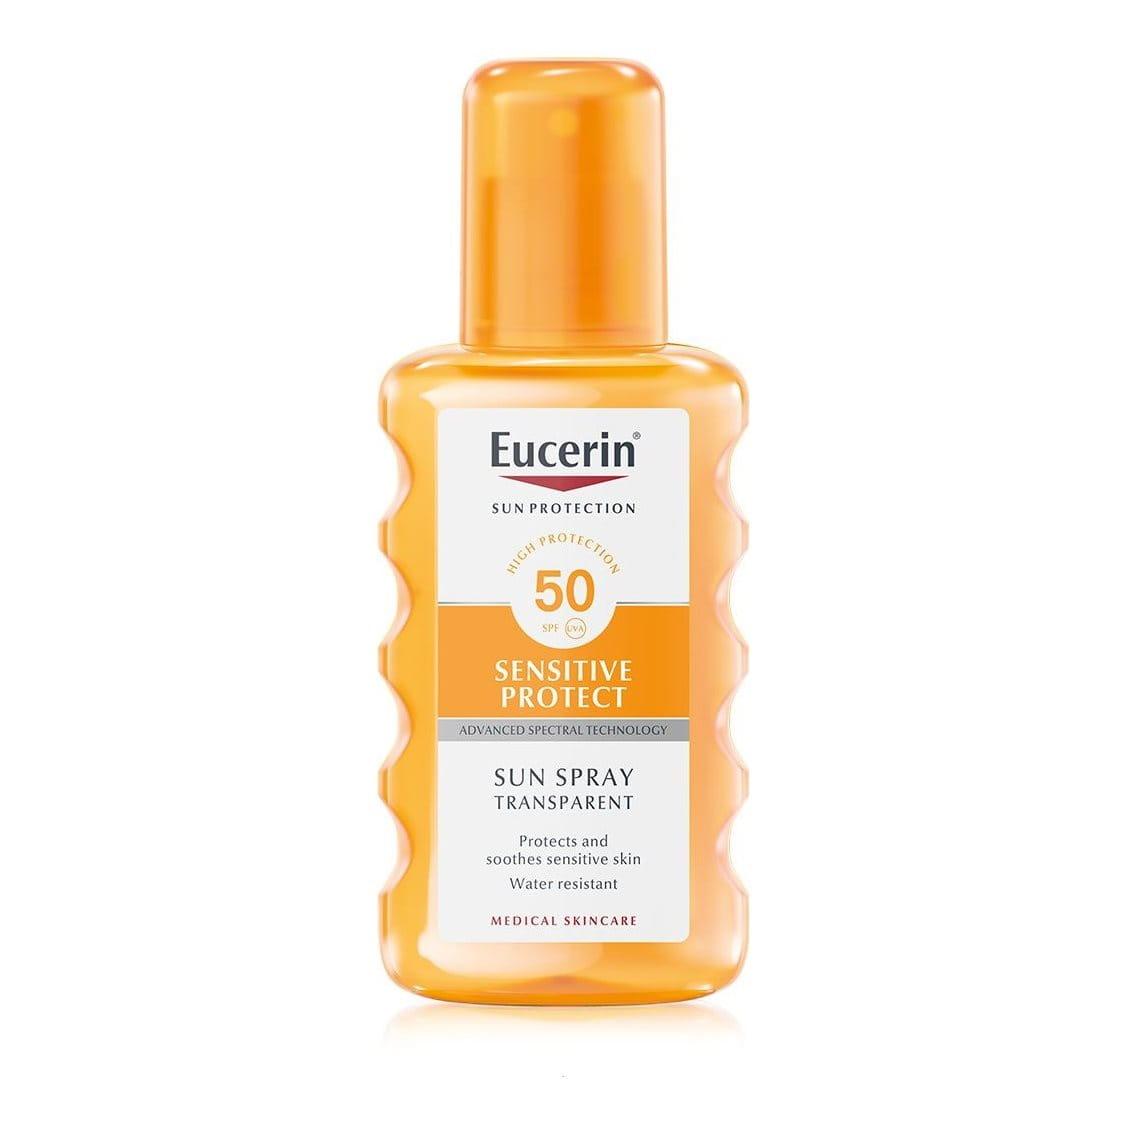 Eucerin Sun Spray Transparent Sensitive Protect SPF50